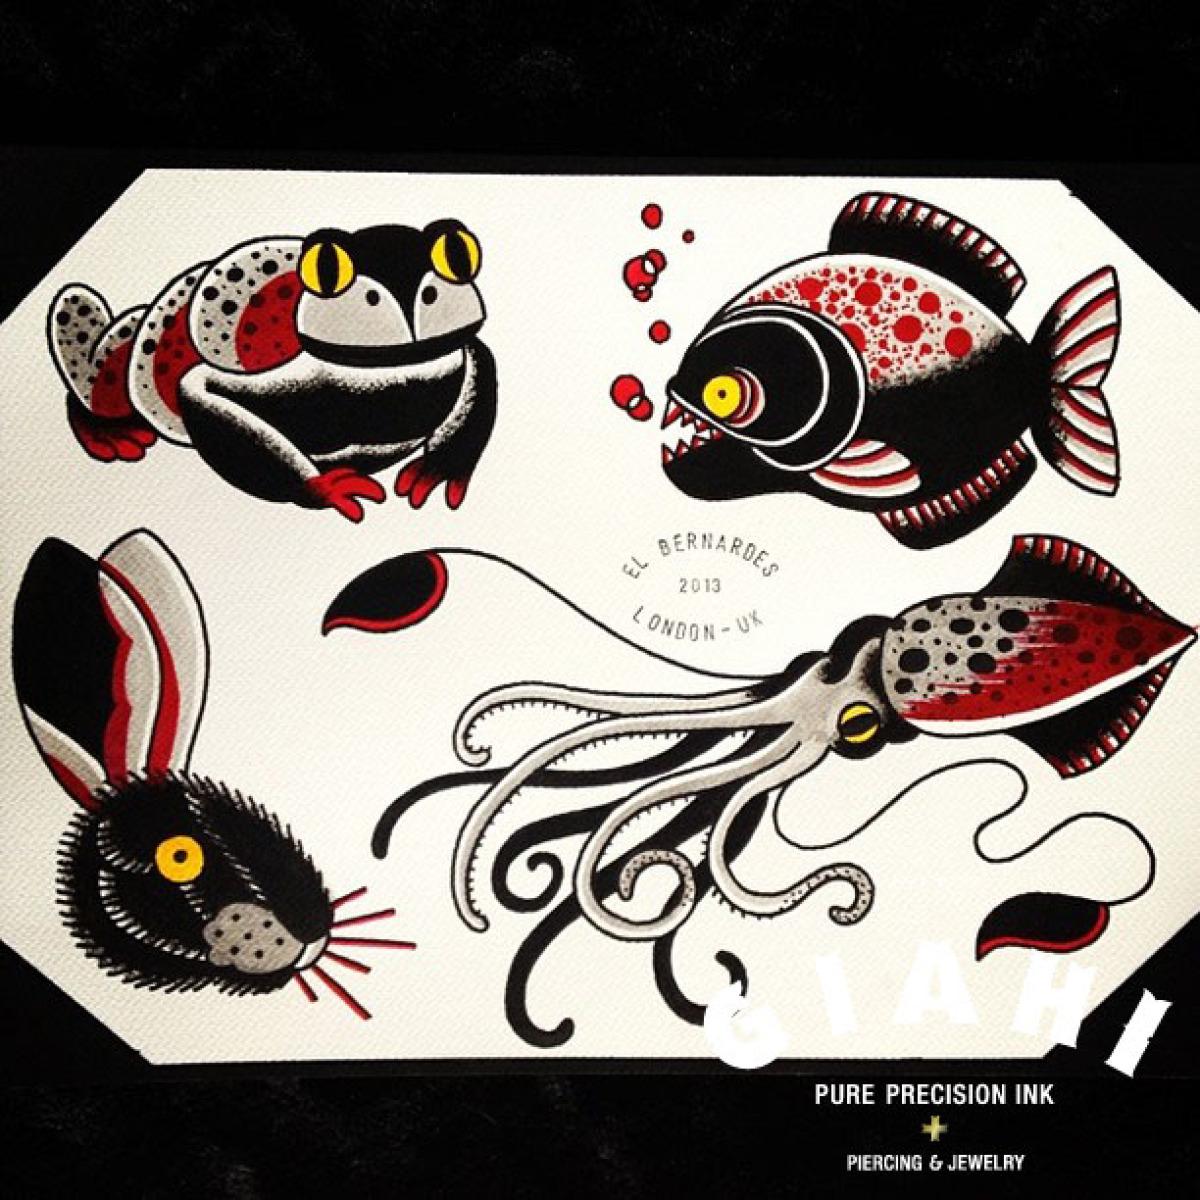 Frog Piranha Hare Squid tattoo ideas by Elda Bernardes